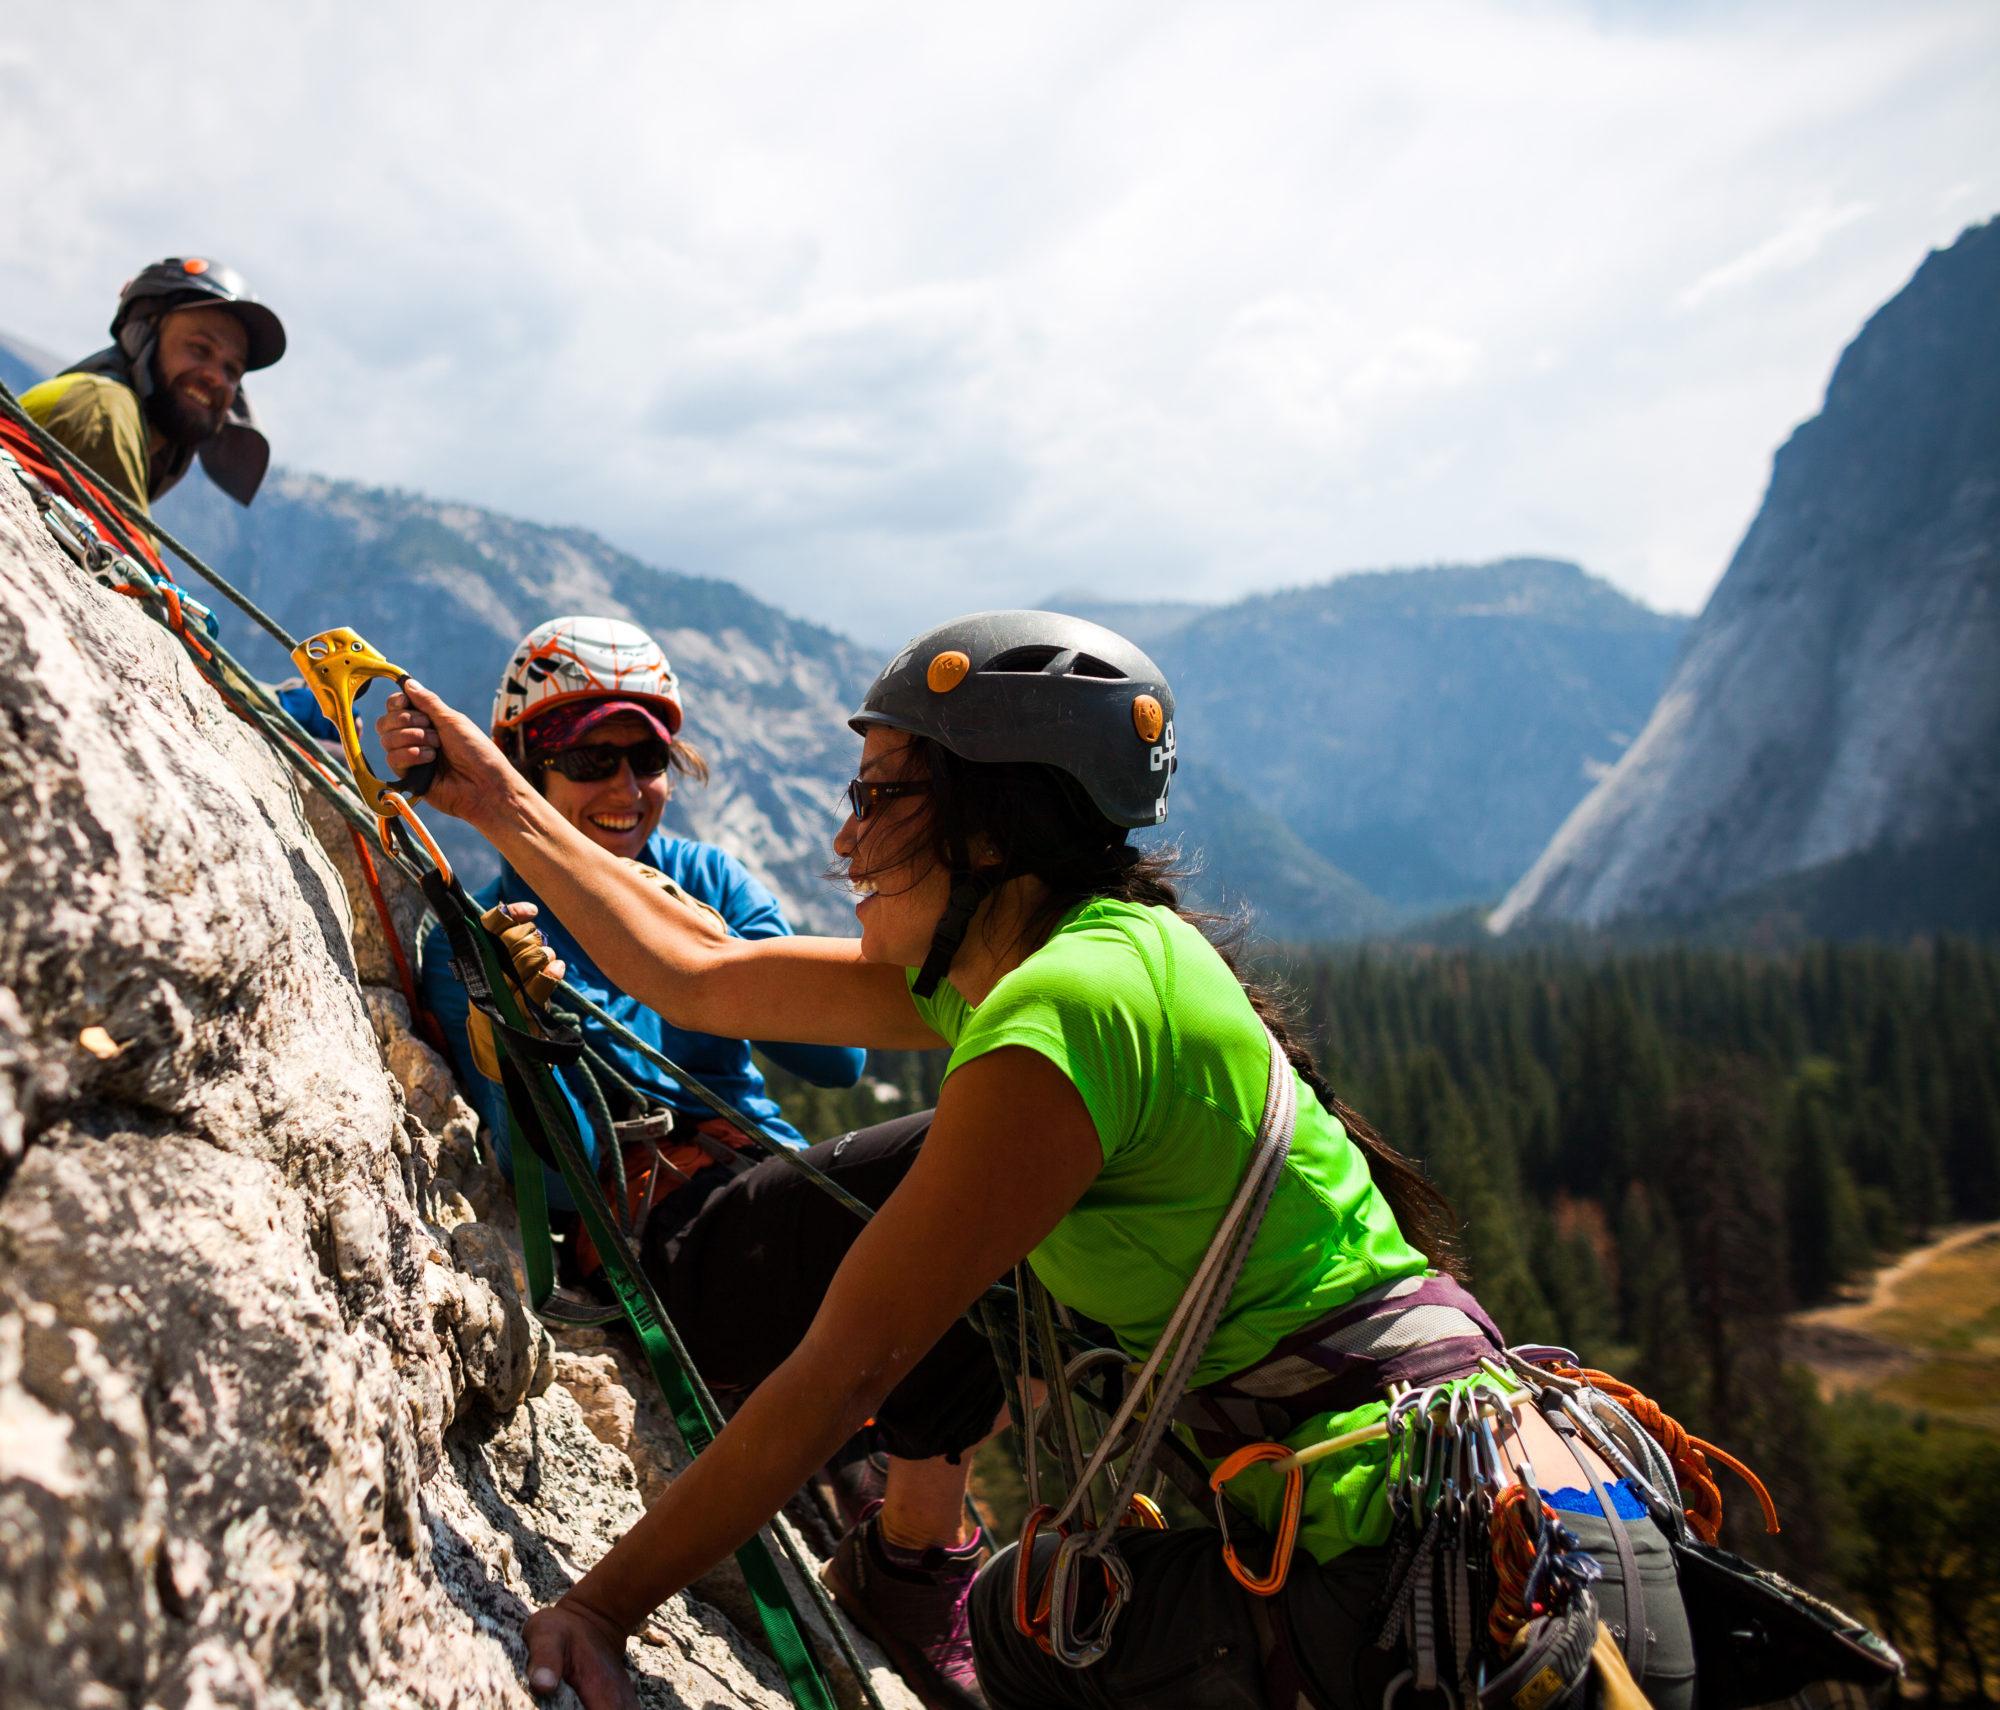 Climbers on the wall on Yosemite Climbing Trip